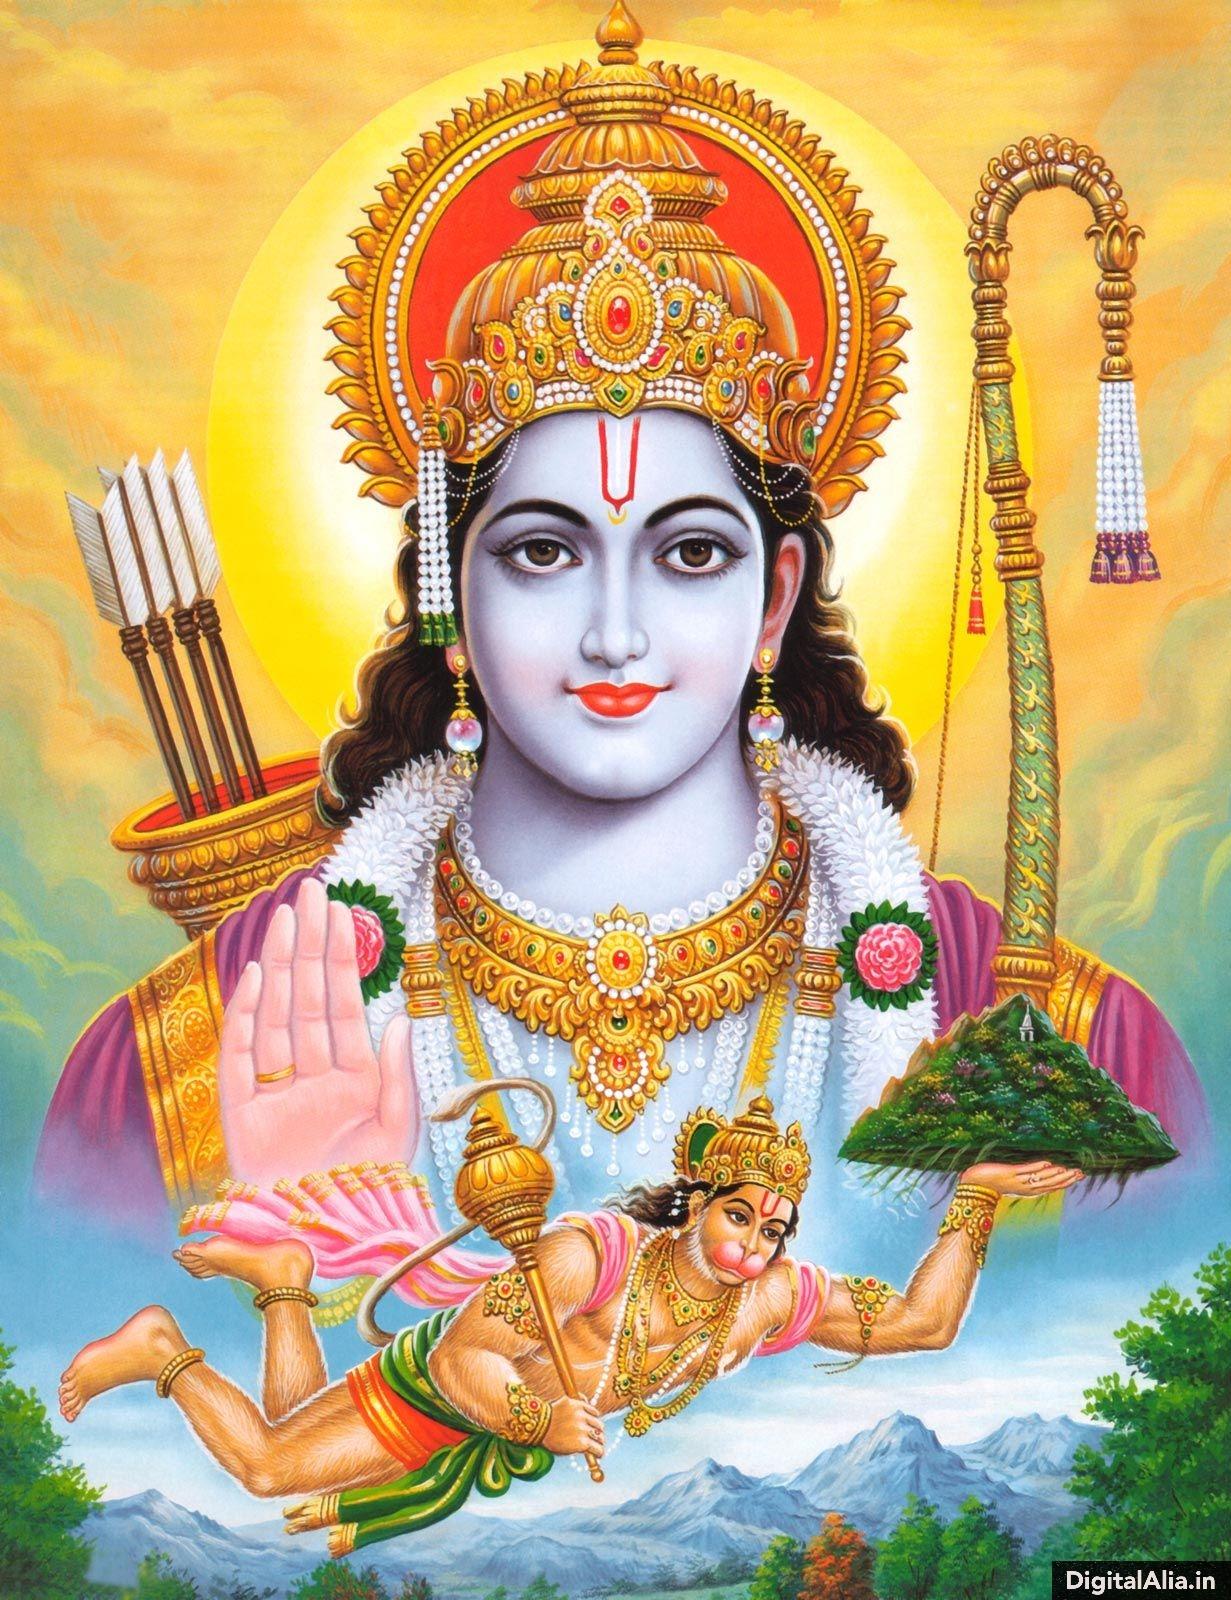 50 Best All Hindu God Images Wallpaper Free Download For Mobile